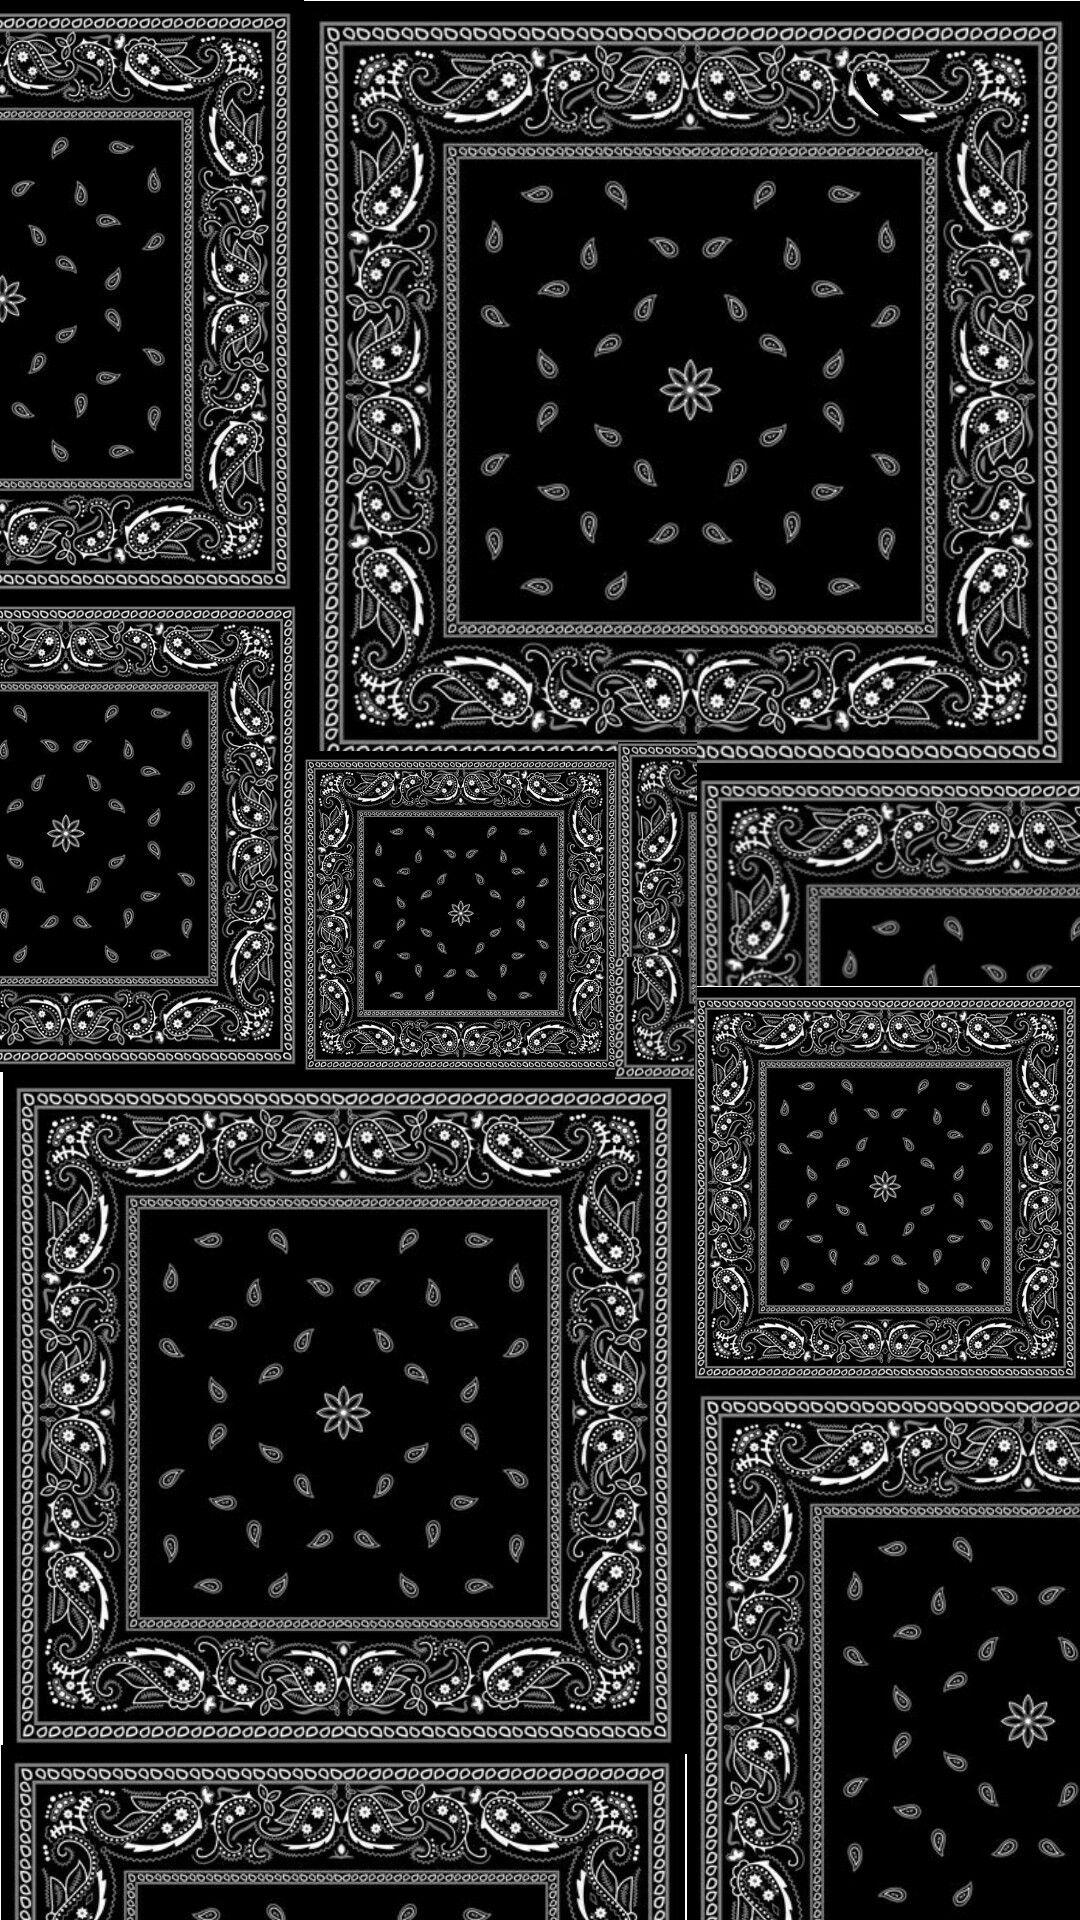 Black Bandana Wallpaper Black Wallpaper Paisley Print Design Graphic Tshirt Design